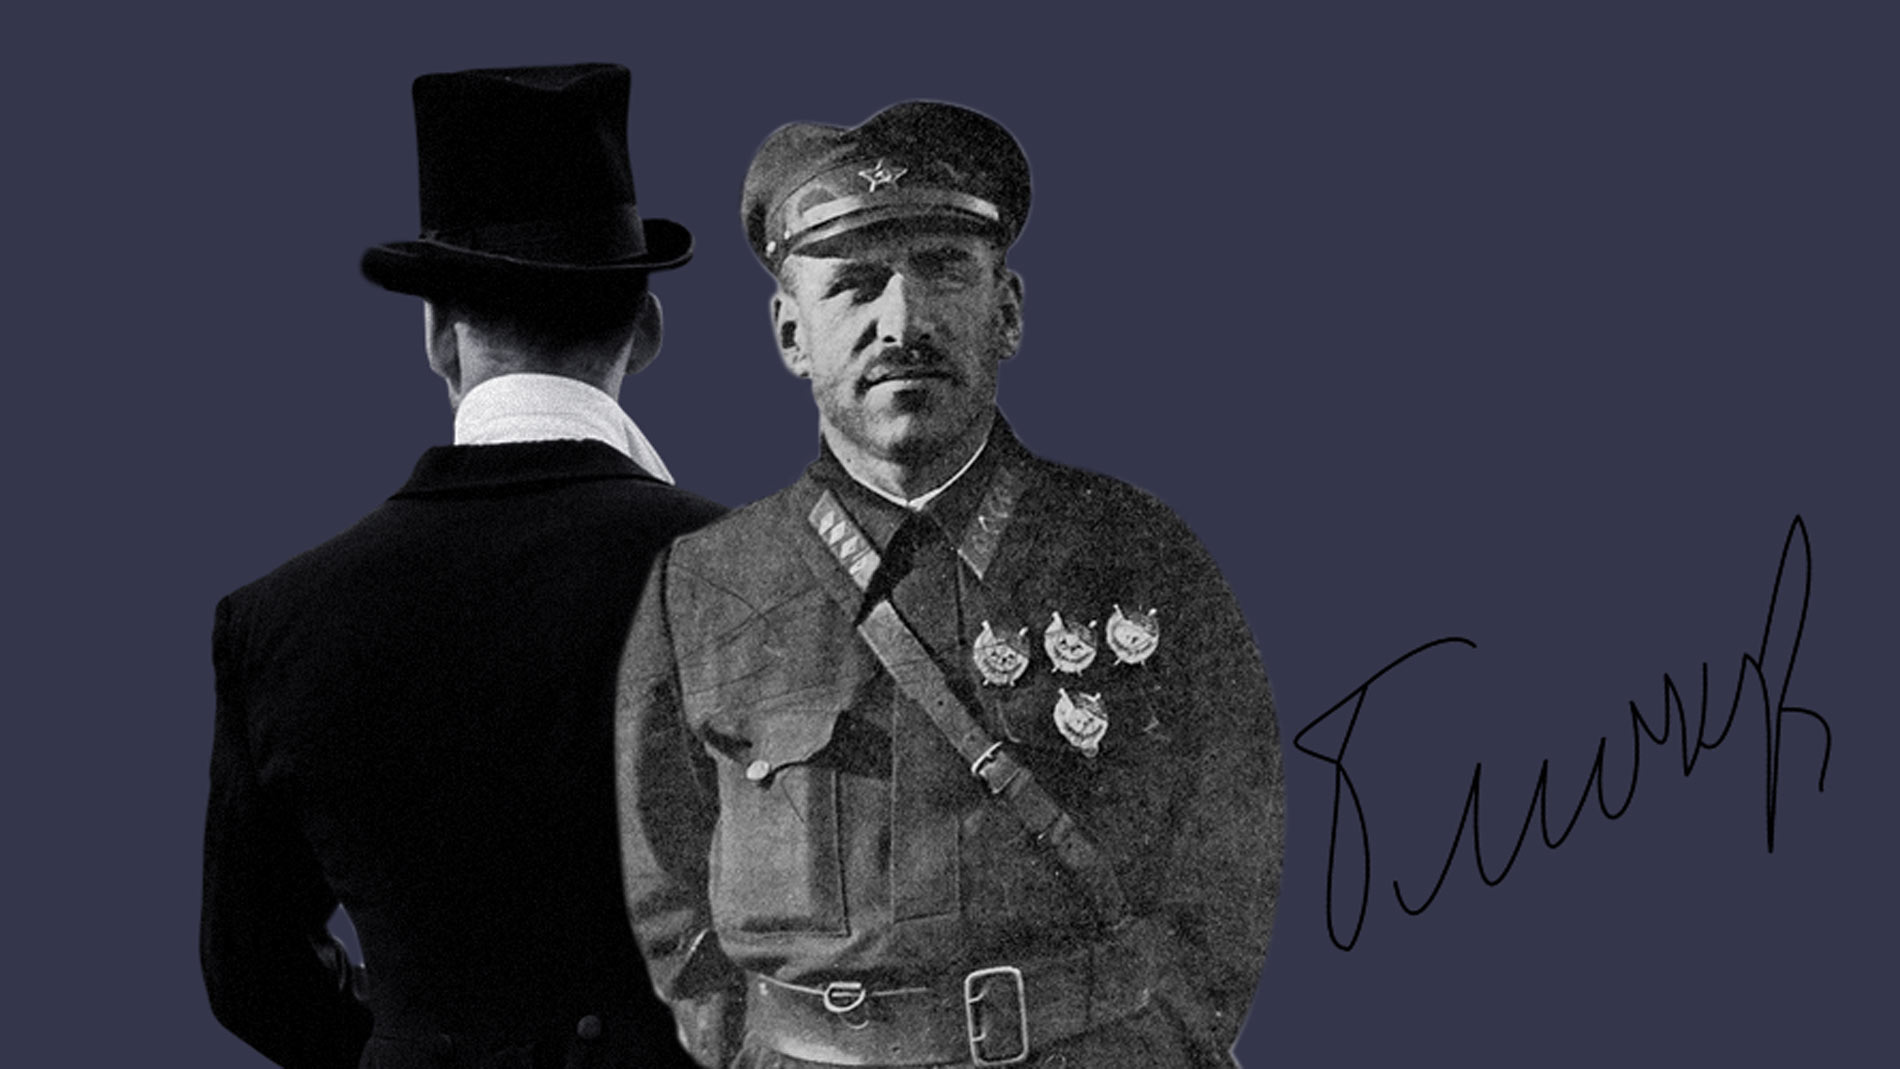 "<p>Коллаж ©LIFE. Фото ©<a href=""https://commons.wikimedia.org/wiki/Category:Vasily_Konstantinovich_Blyukher#/media/File:1925_sovjet_military_advisors_schalfeew_bl%C3%BCcher.jpg"" target=""_blank"" rel=""noopener noreferrer"">Wikipedia</a></p>"